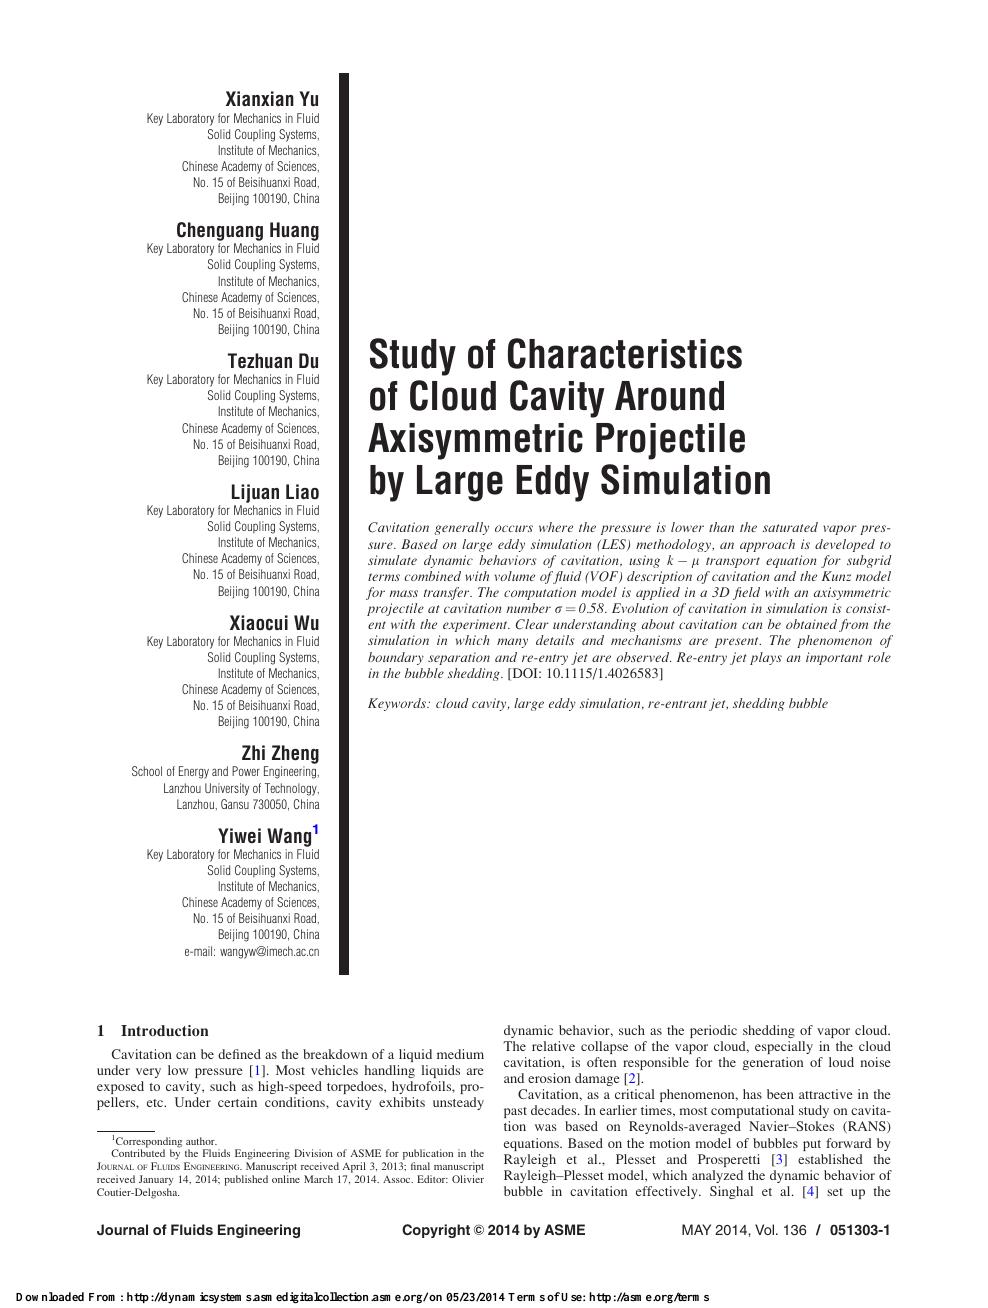 Study of Characteristics of Cloud Cavity Around Axisymmetric